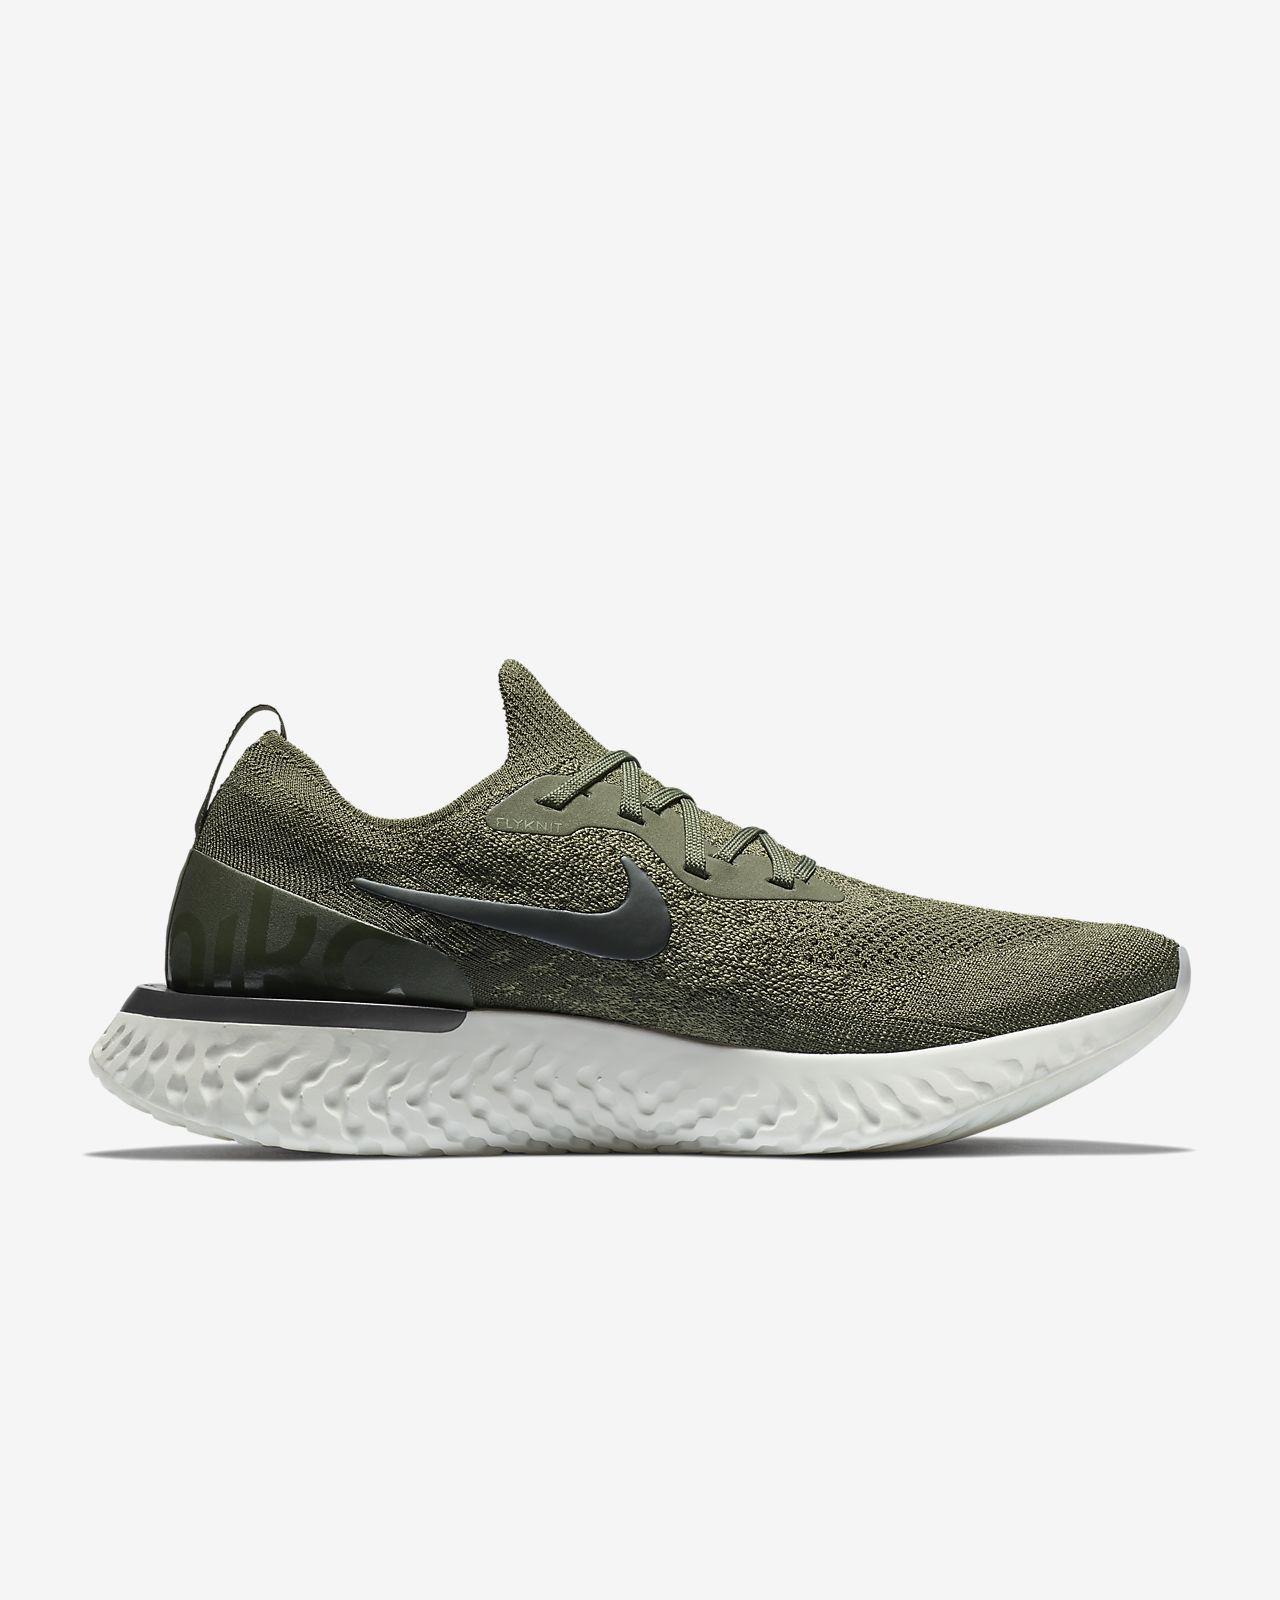 Billig Annonsering 2018 Salg Nike Lunarglide 6 Anti Fur